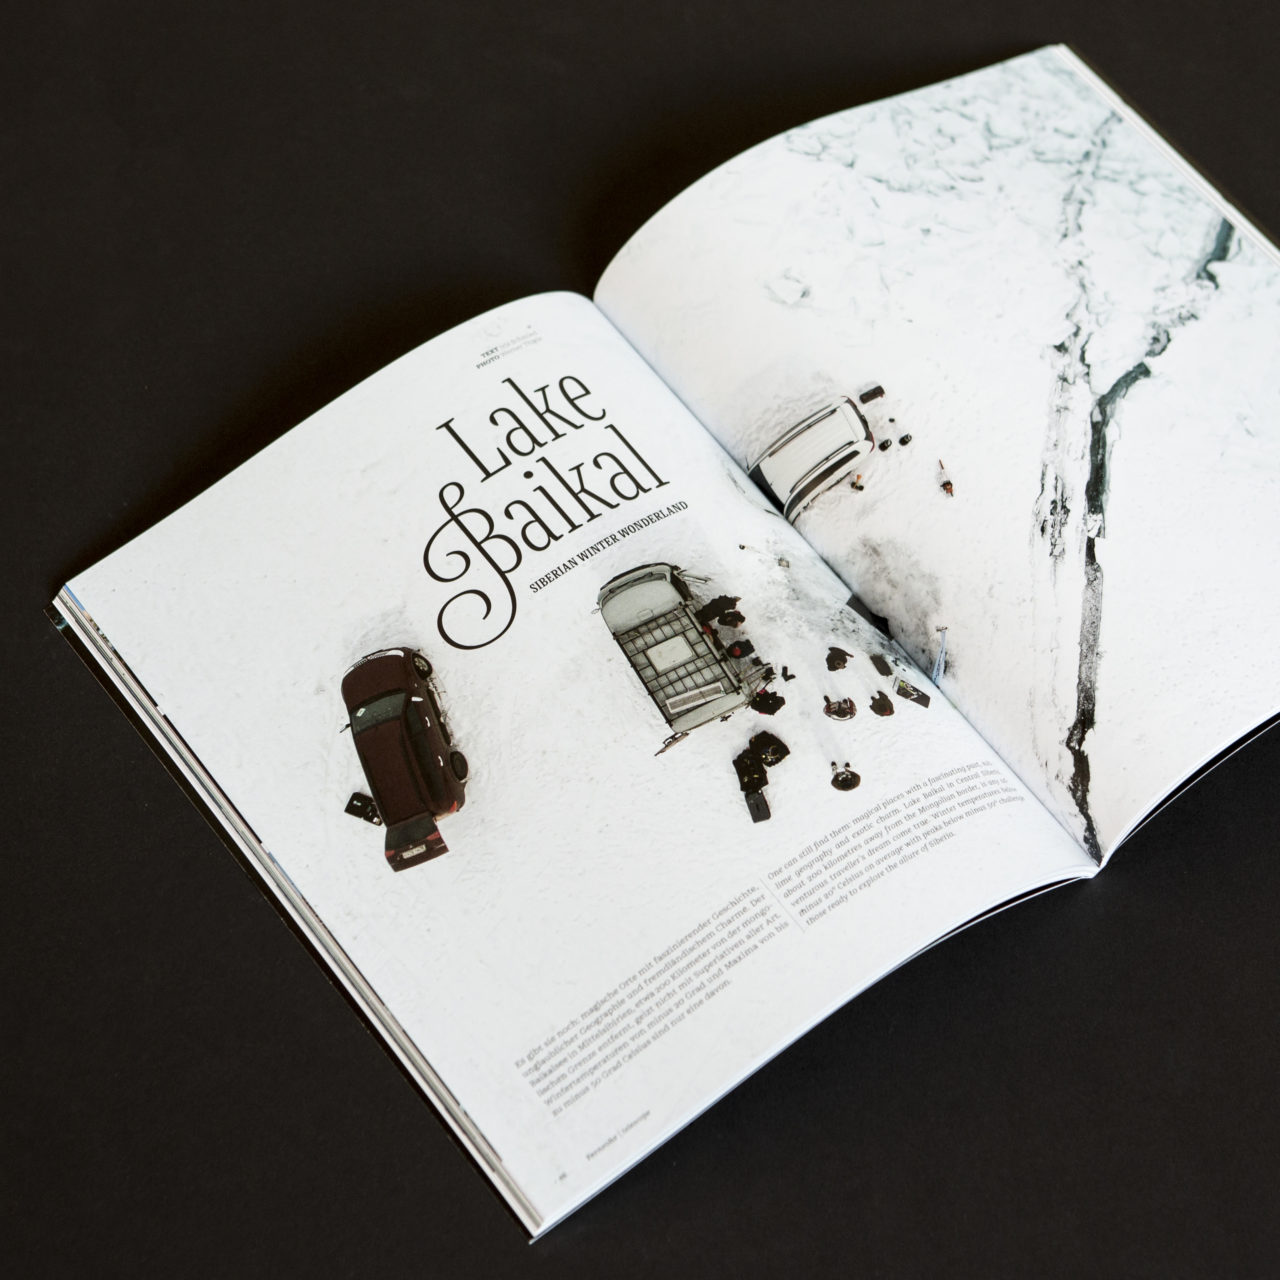 Bluescape Ausgabe 2 Artikel Baikal